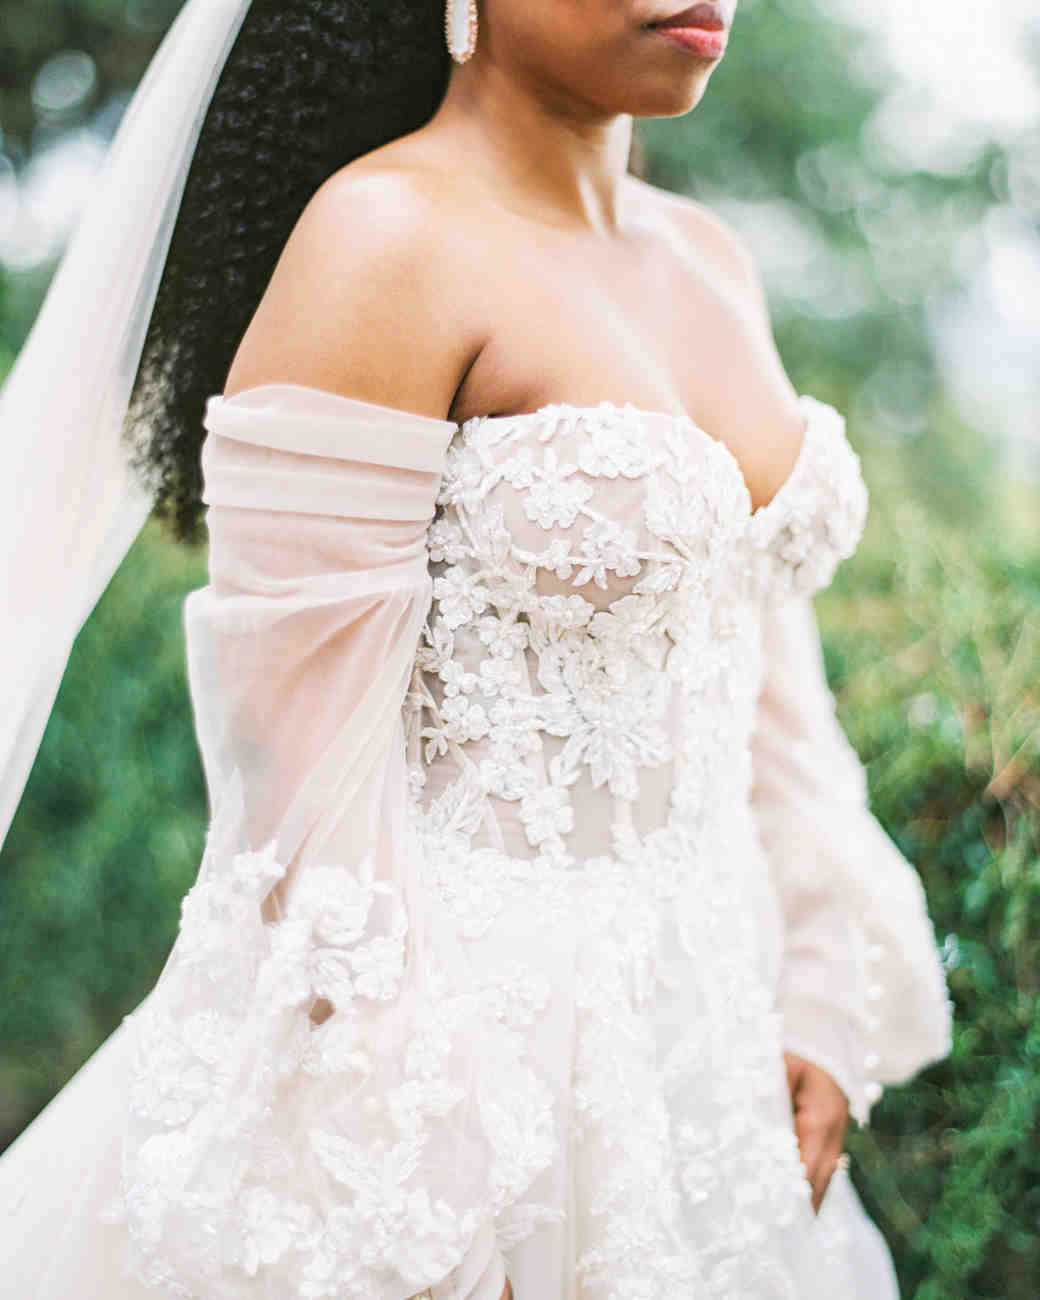 jamie and michael wedding dress sleeve detail